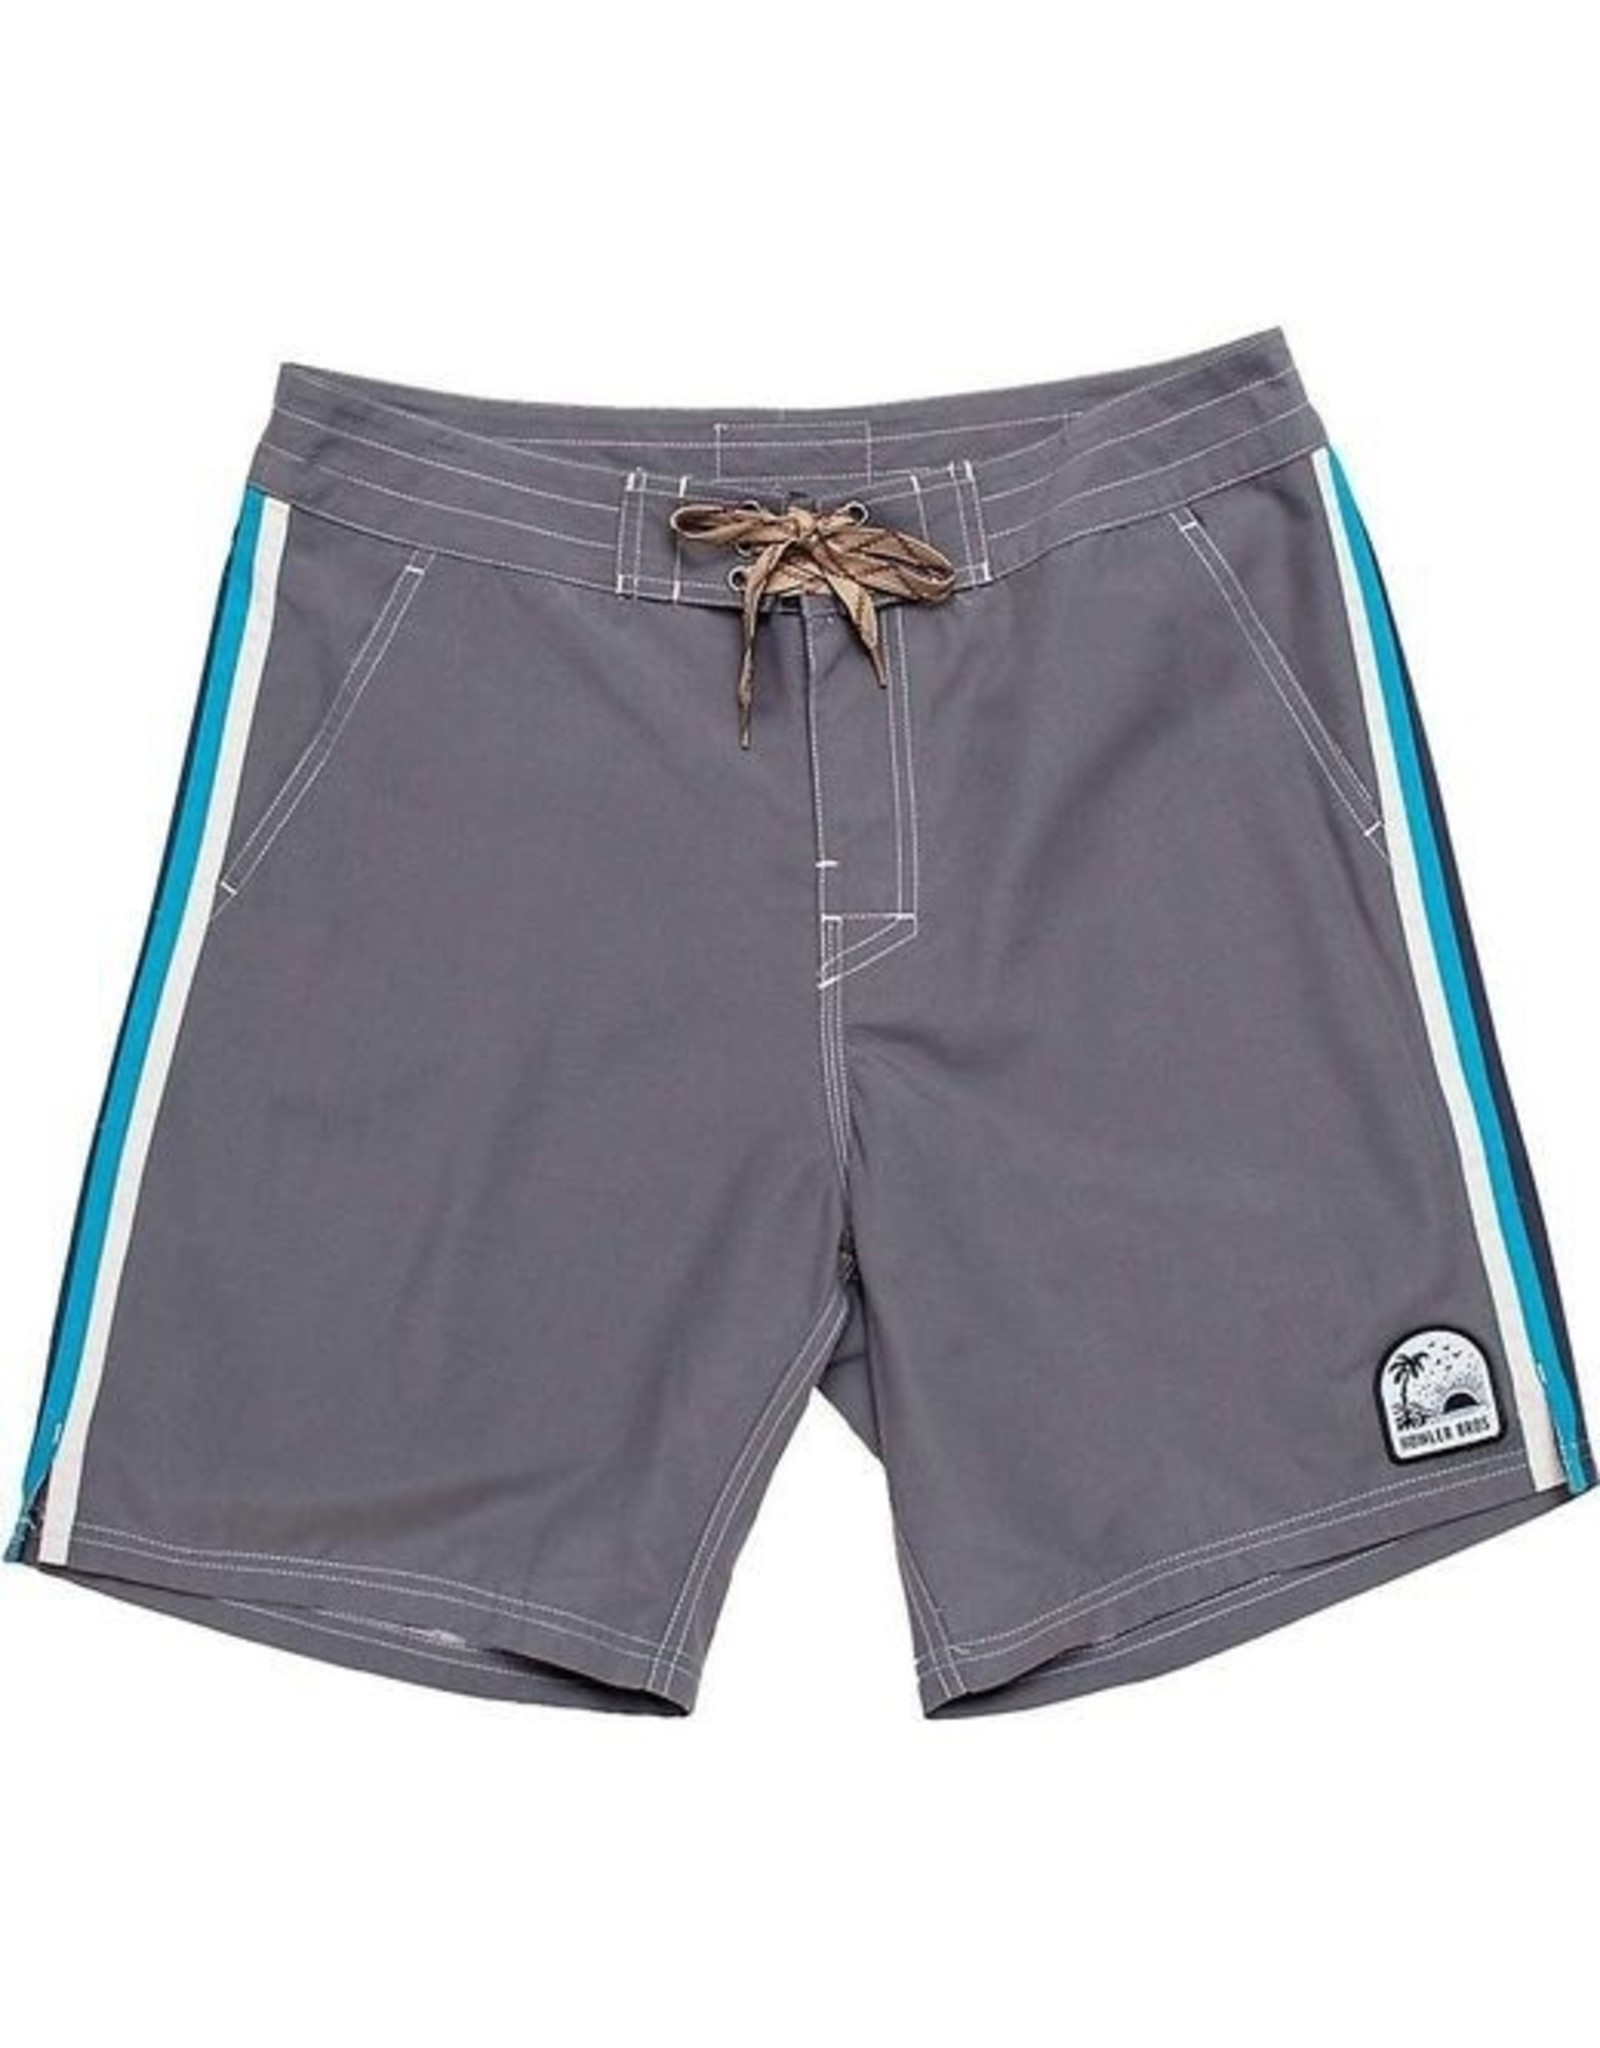 Howler Howler Chandler Old School Board Shorts  Grey w/Stripe